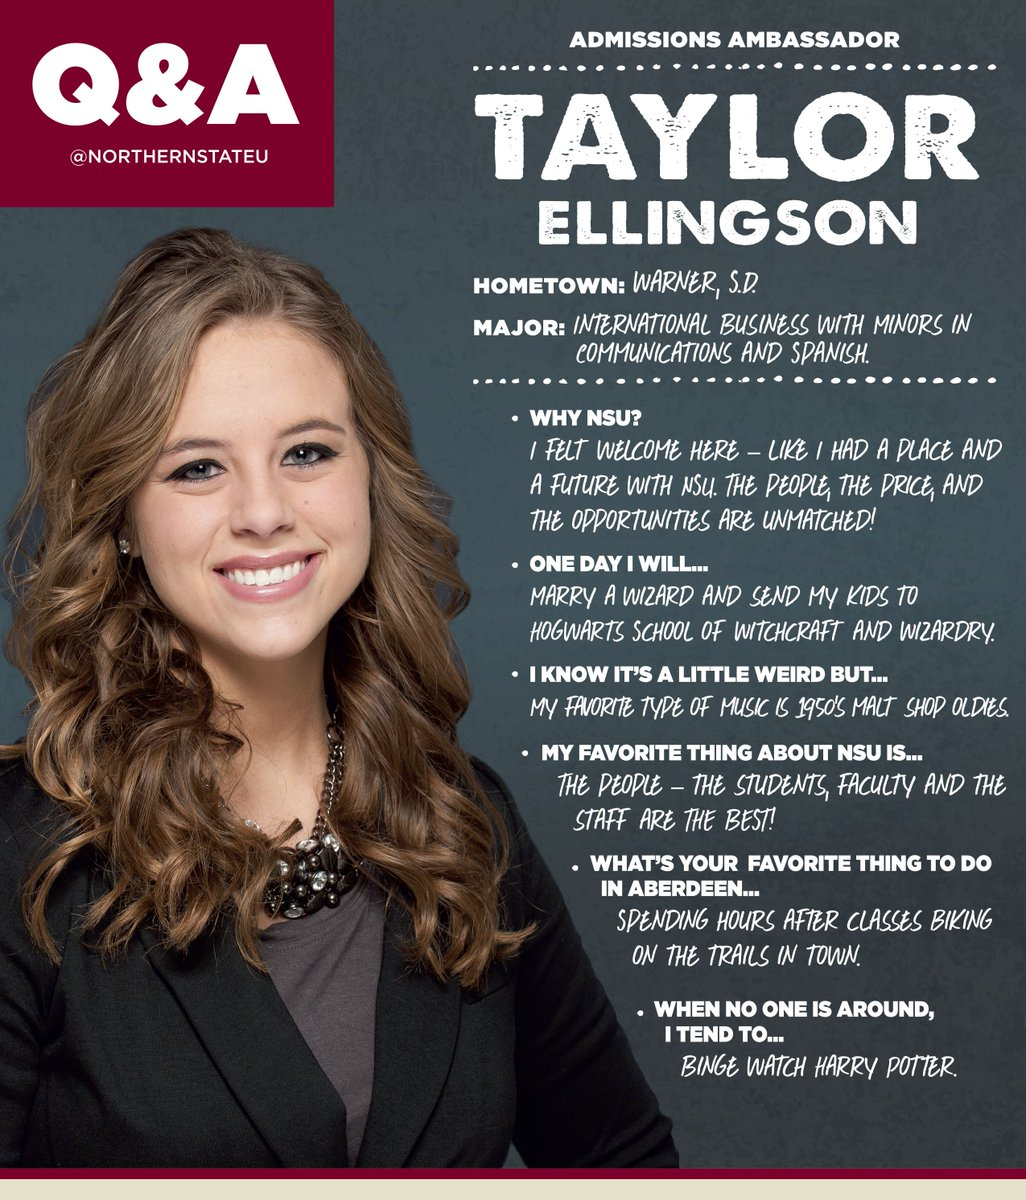 Taylor ellingson